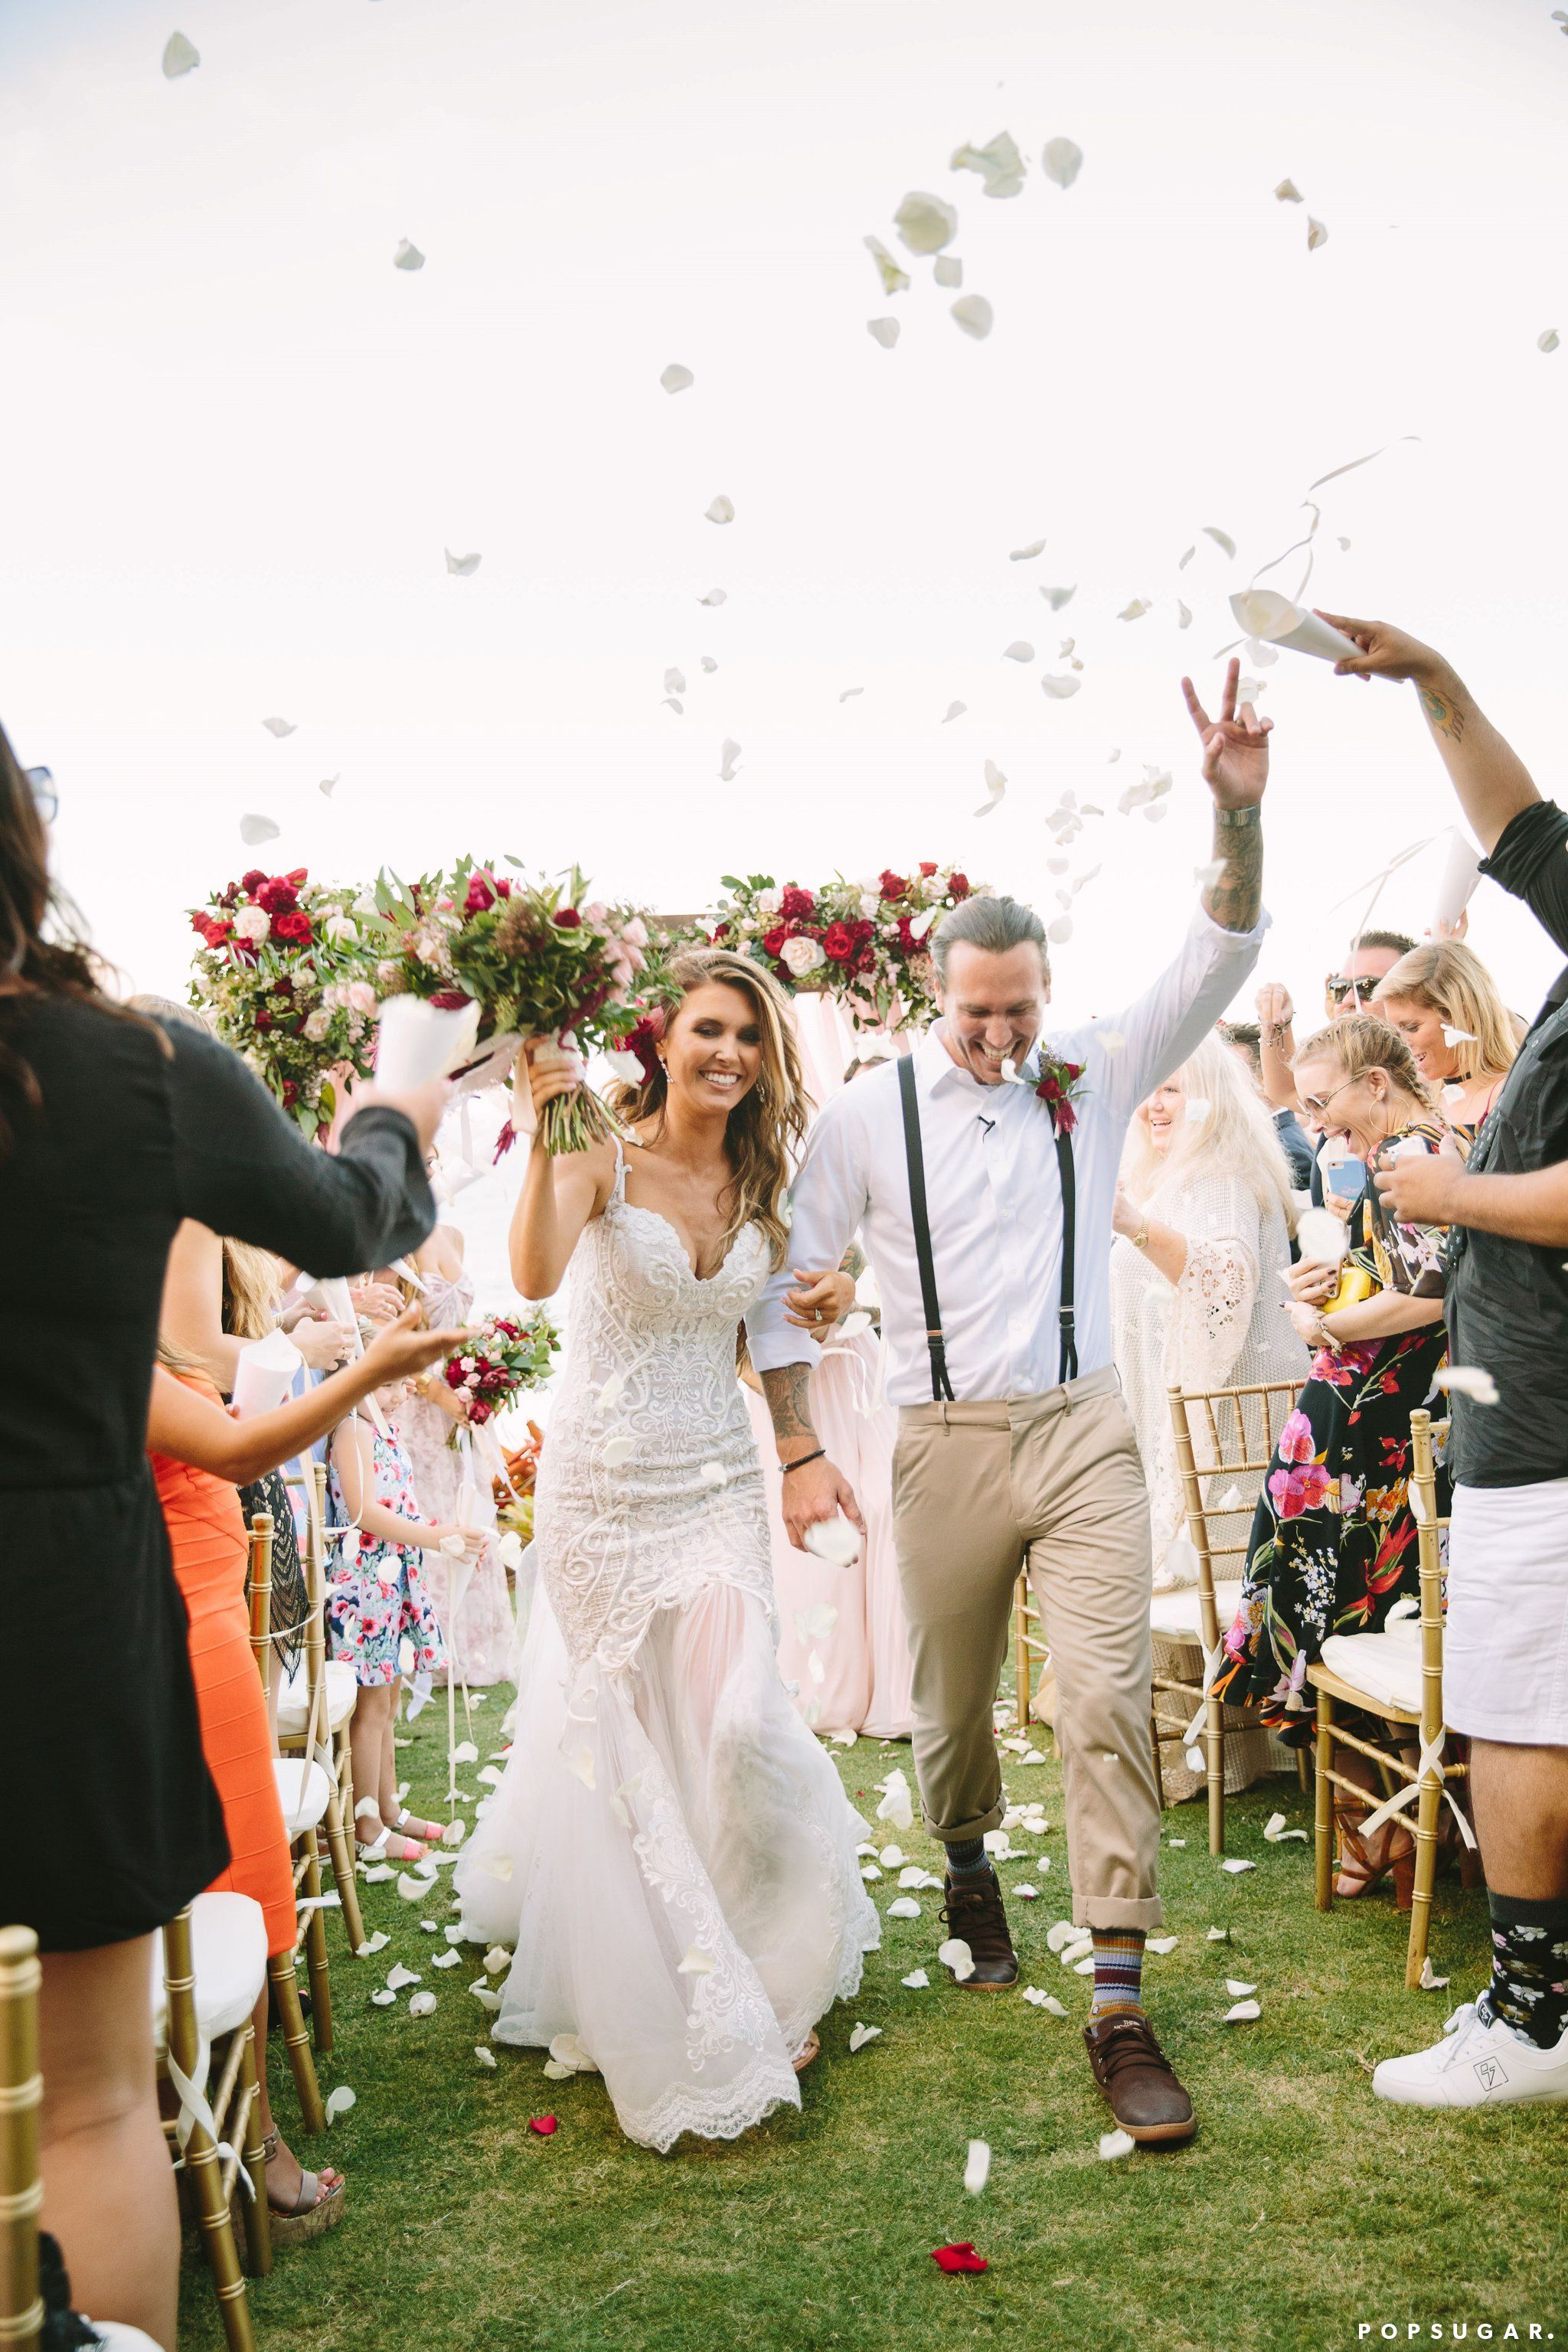 Kandi burruss wedding dress  See Photos From Audrina Patridge and Corey Bohanus Romantic Hawaiian